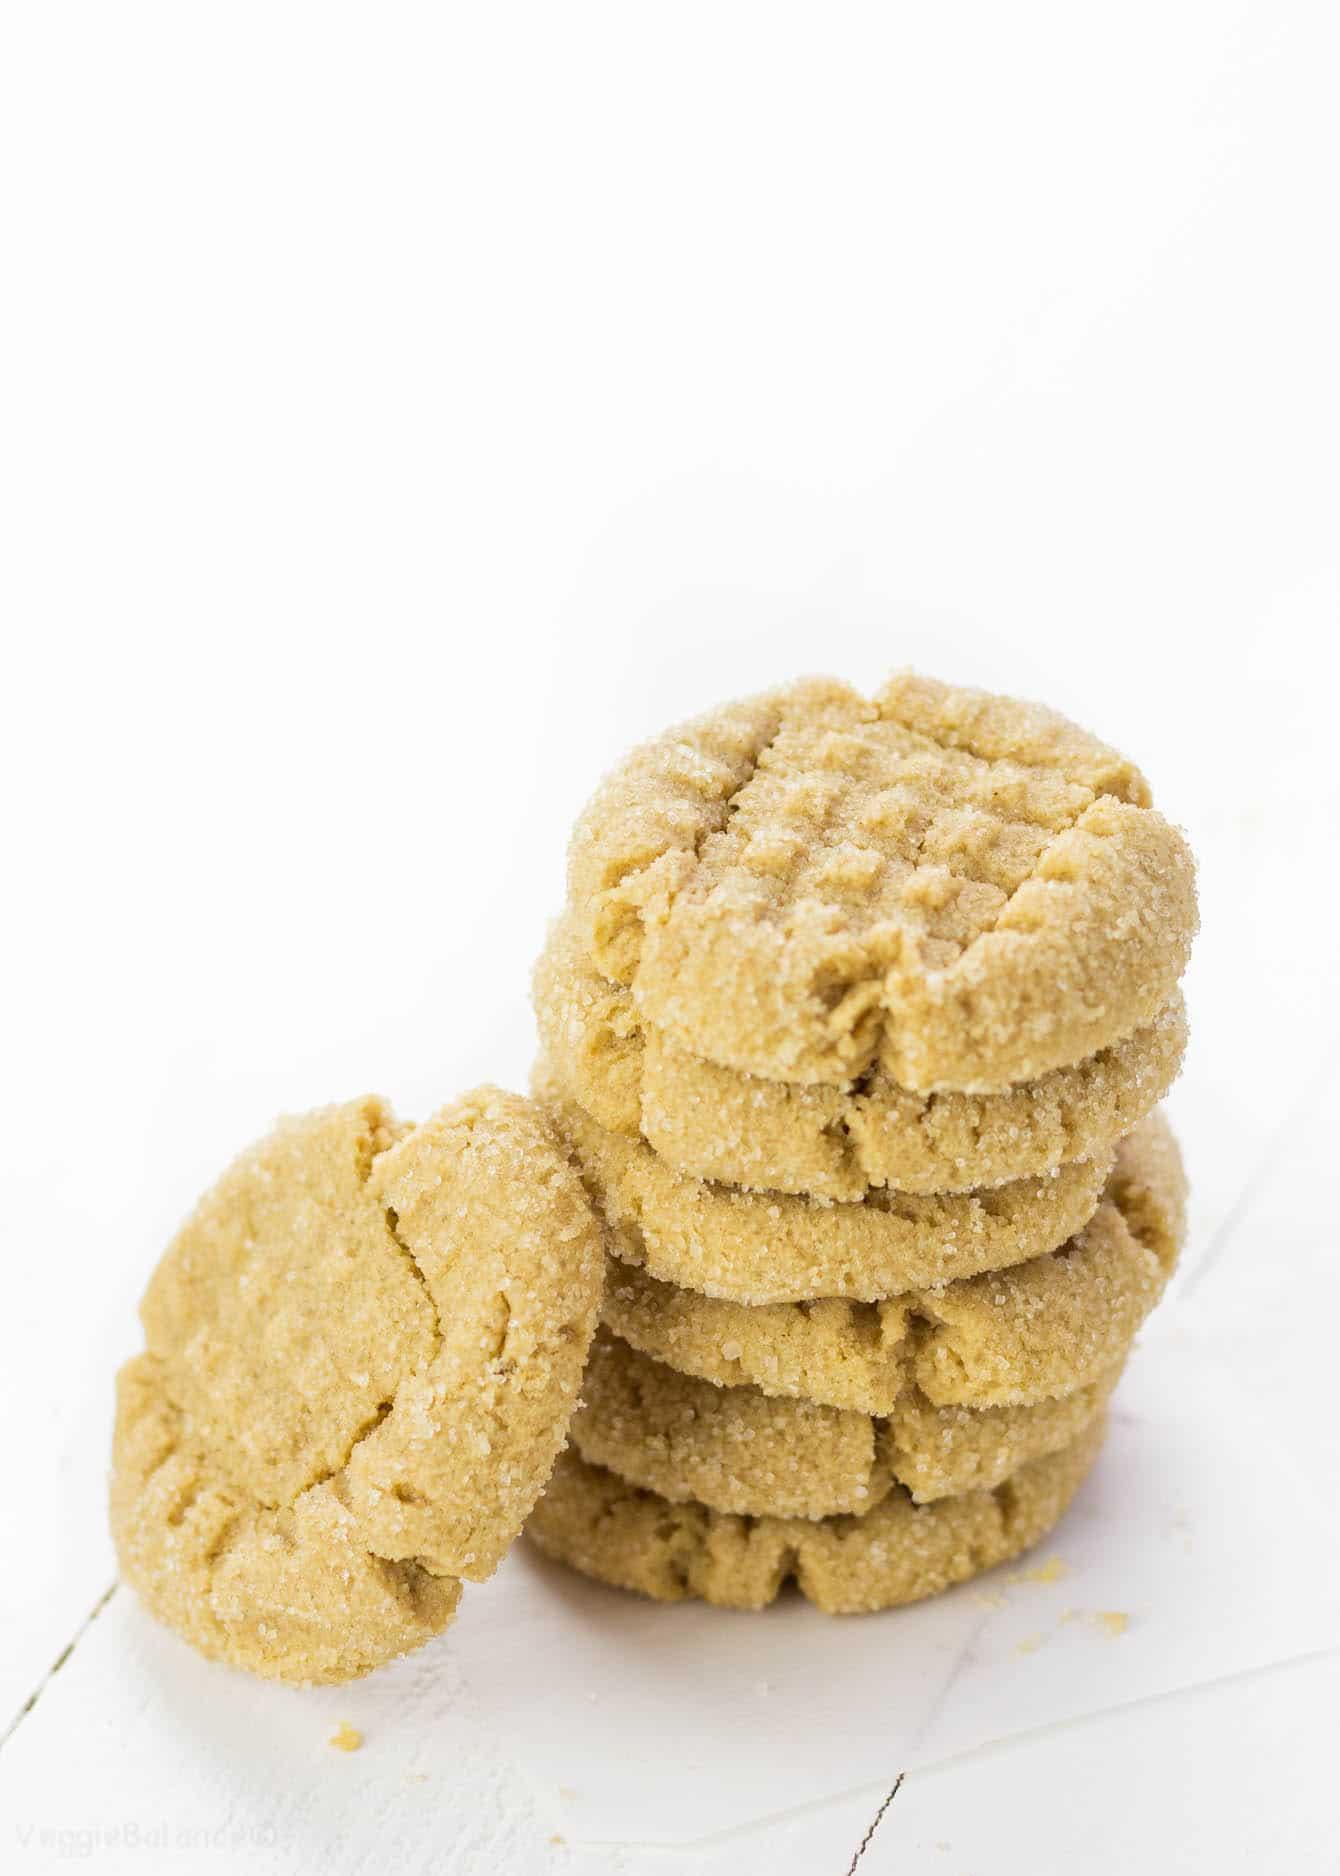 Gluten Free Peanut Butter Cookies